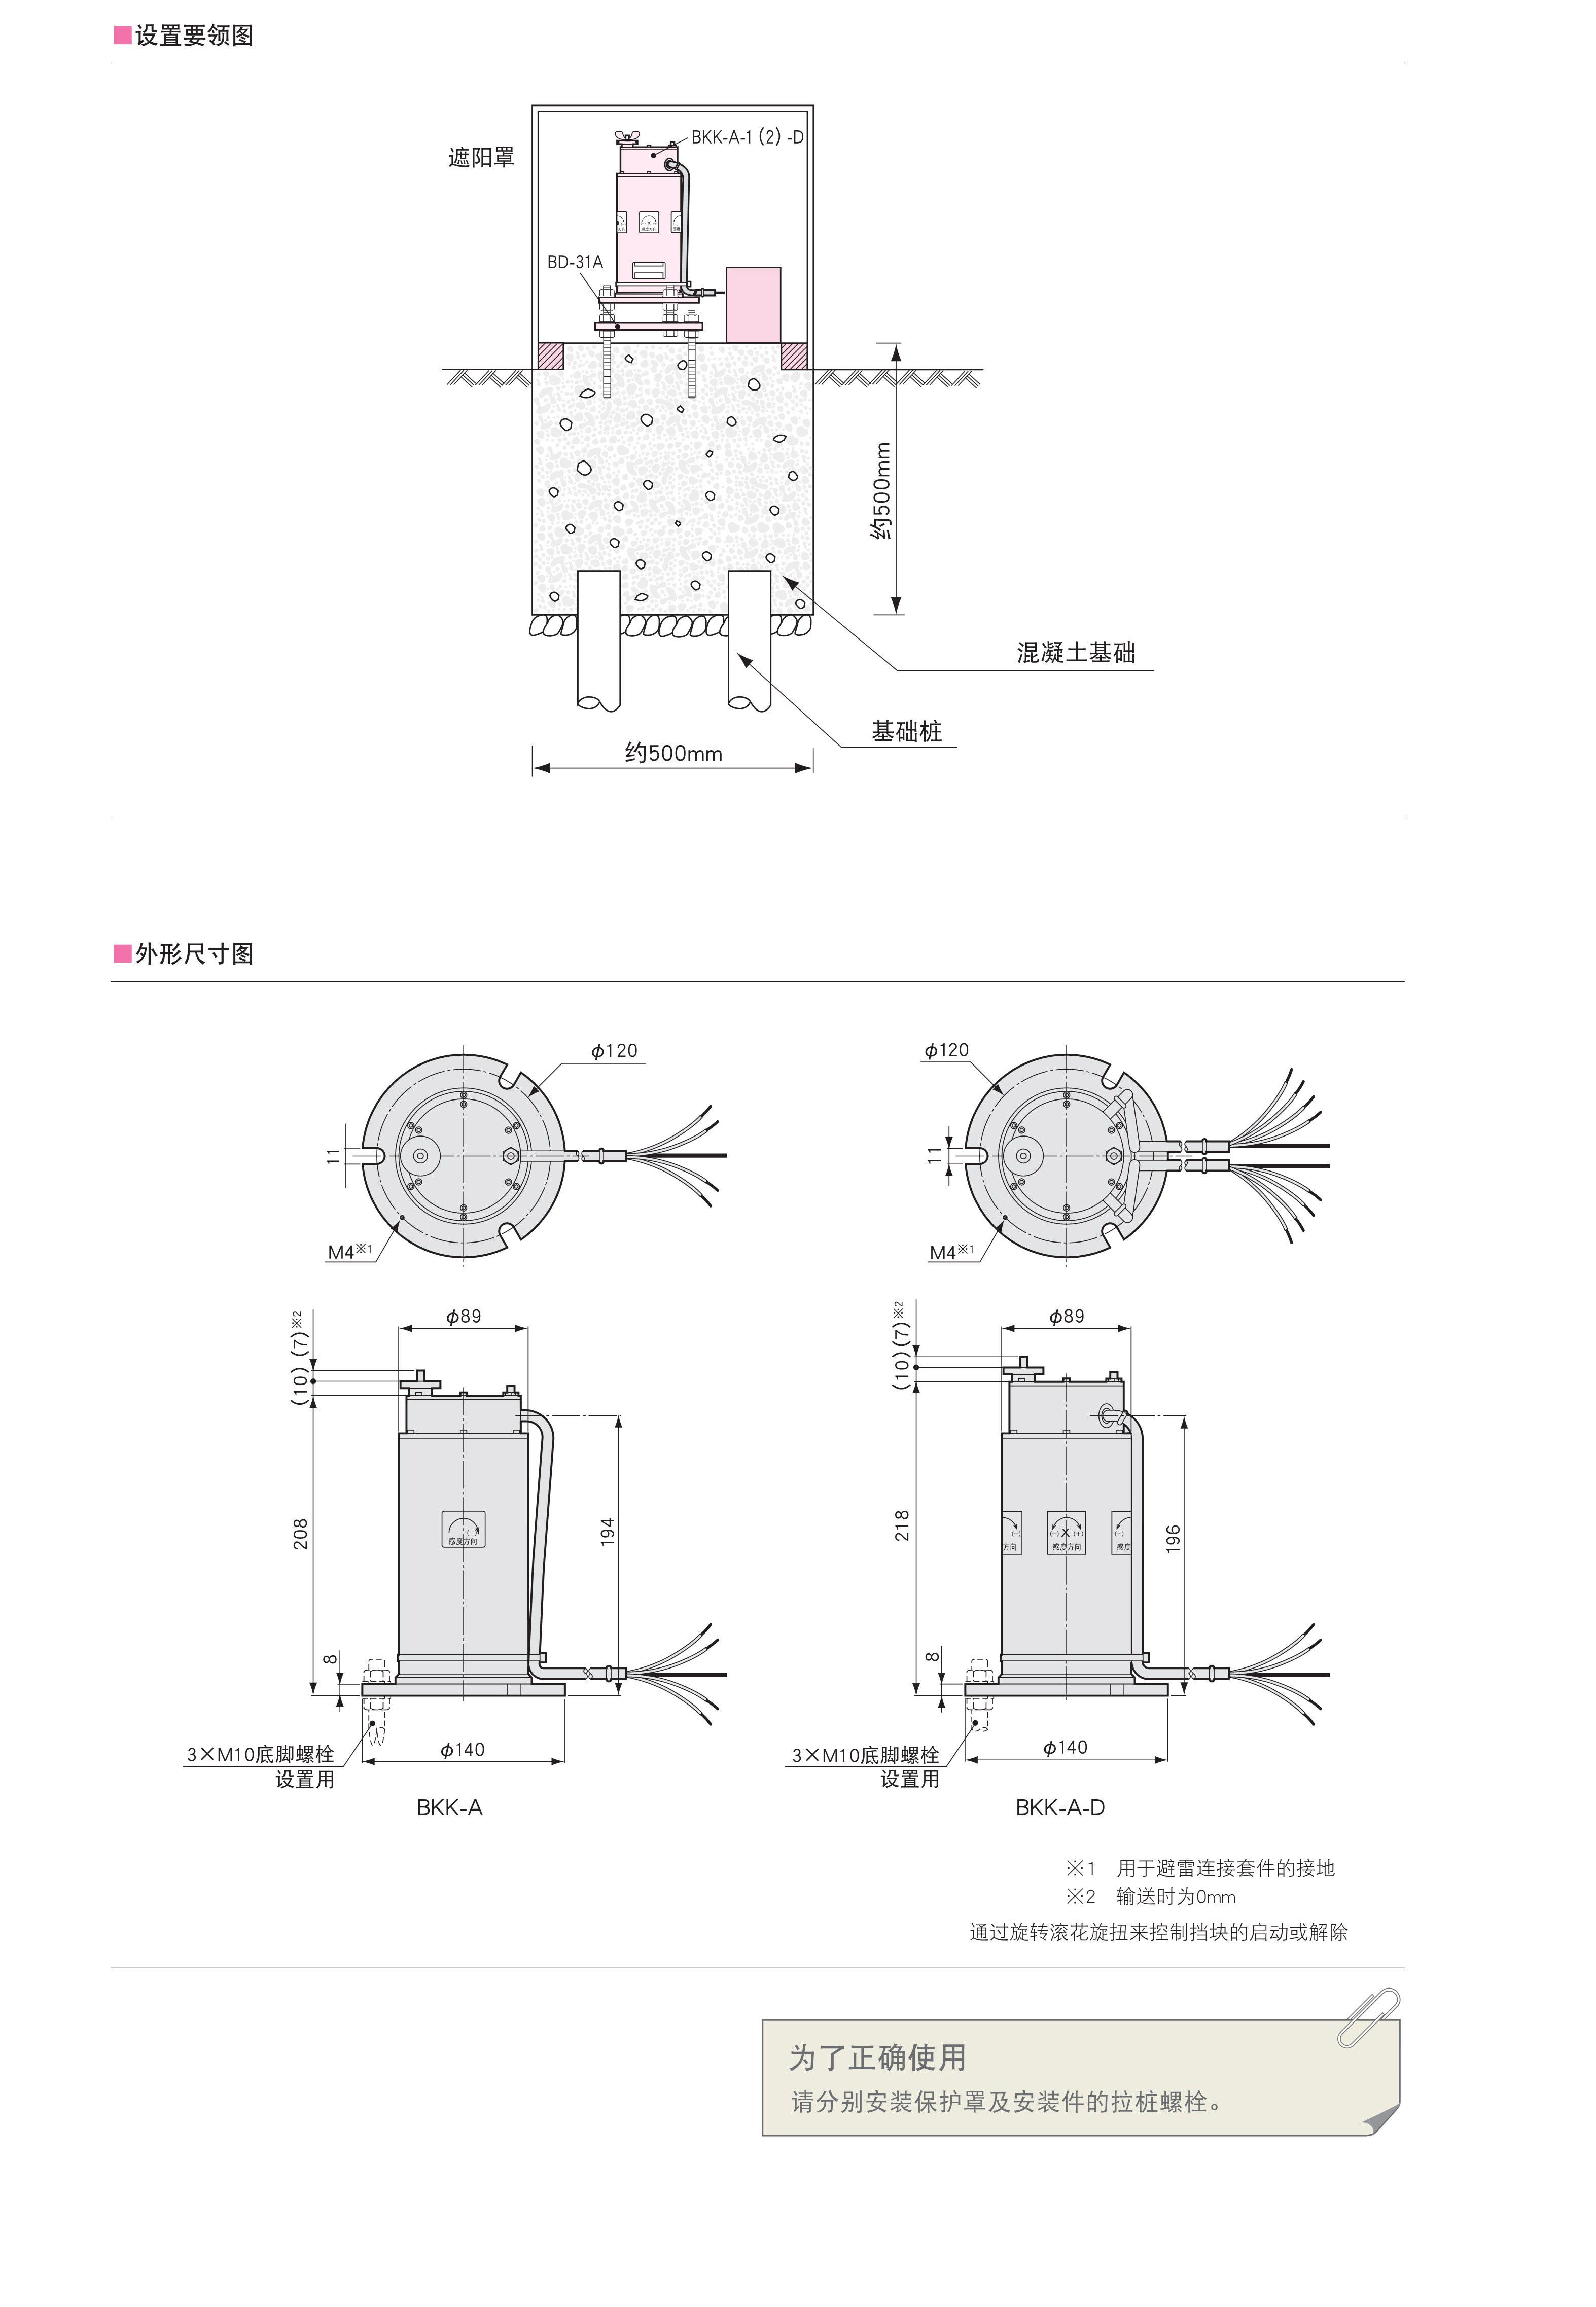 BKK-A安装型倾斜仪_BKK-A-D设置式倾斜计_日本kyowa